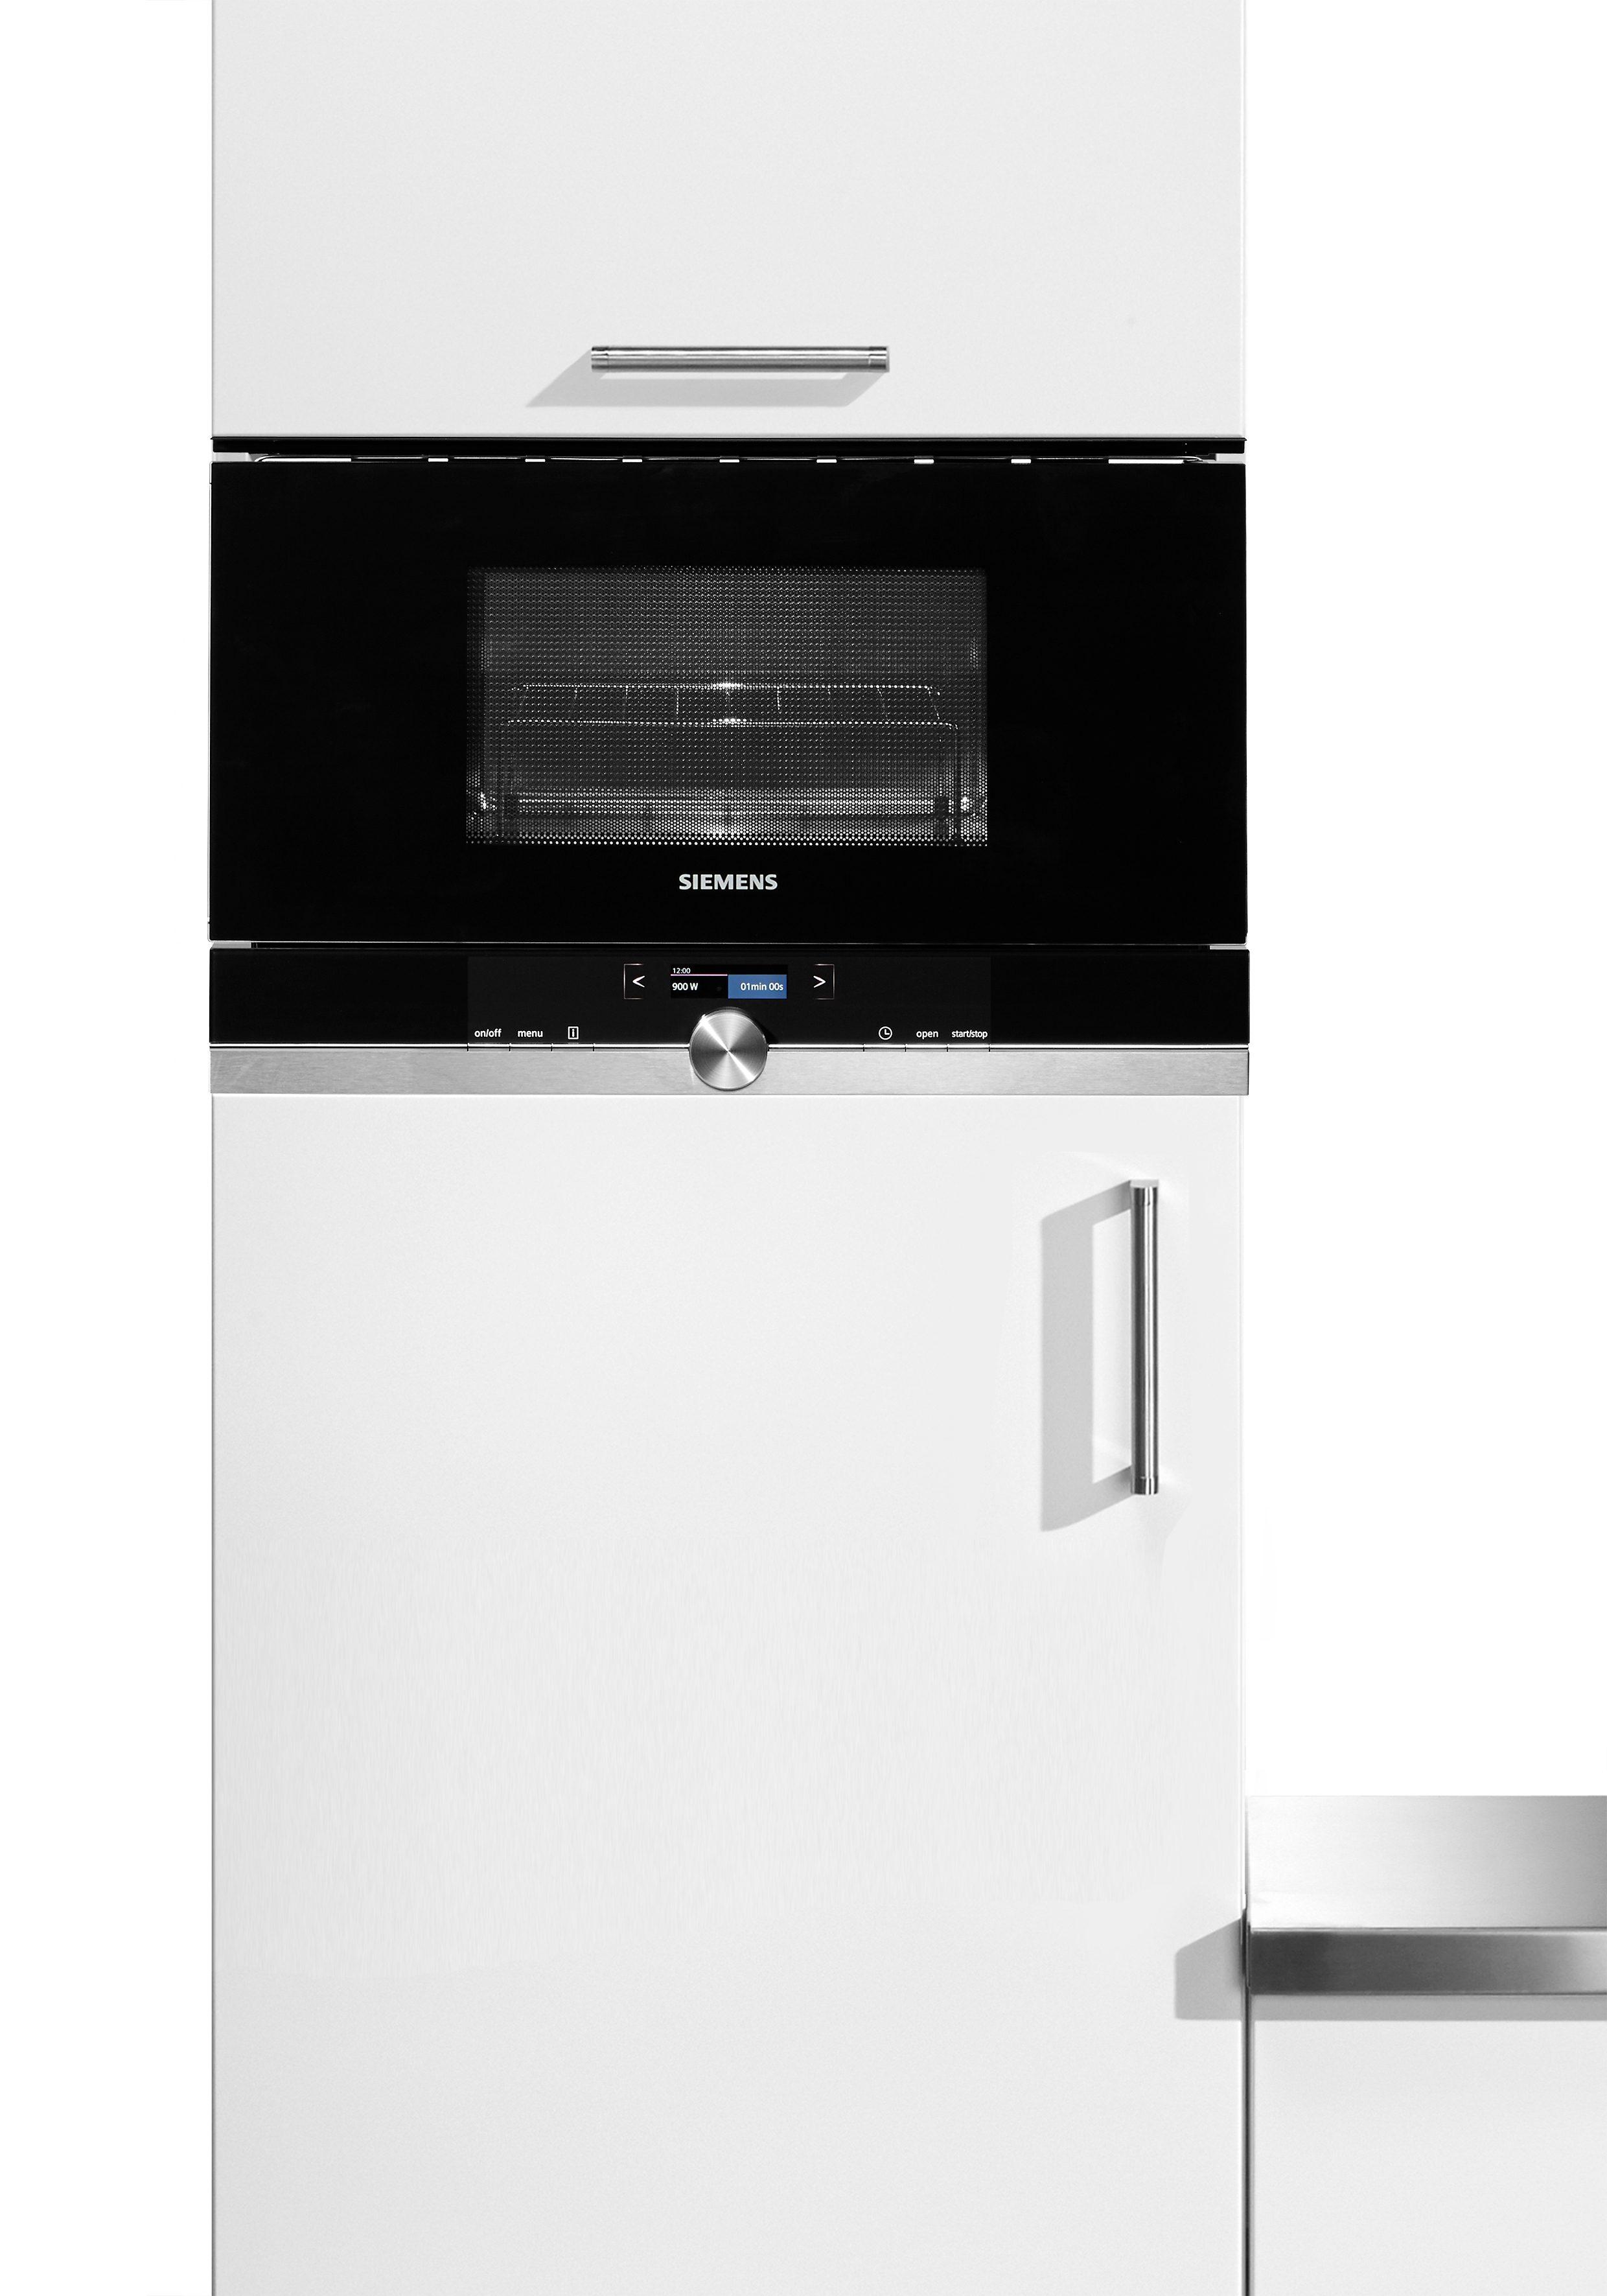 "Siemens Einbaumikrowelle iQ700 ""BE634LGS1"", mit Grill, 21 Liter, 900 Watt"